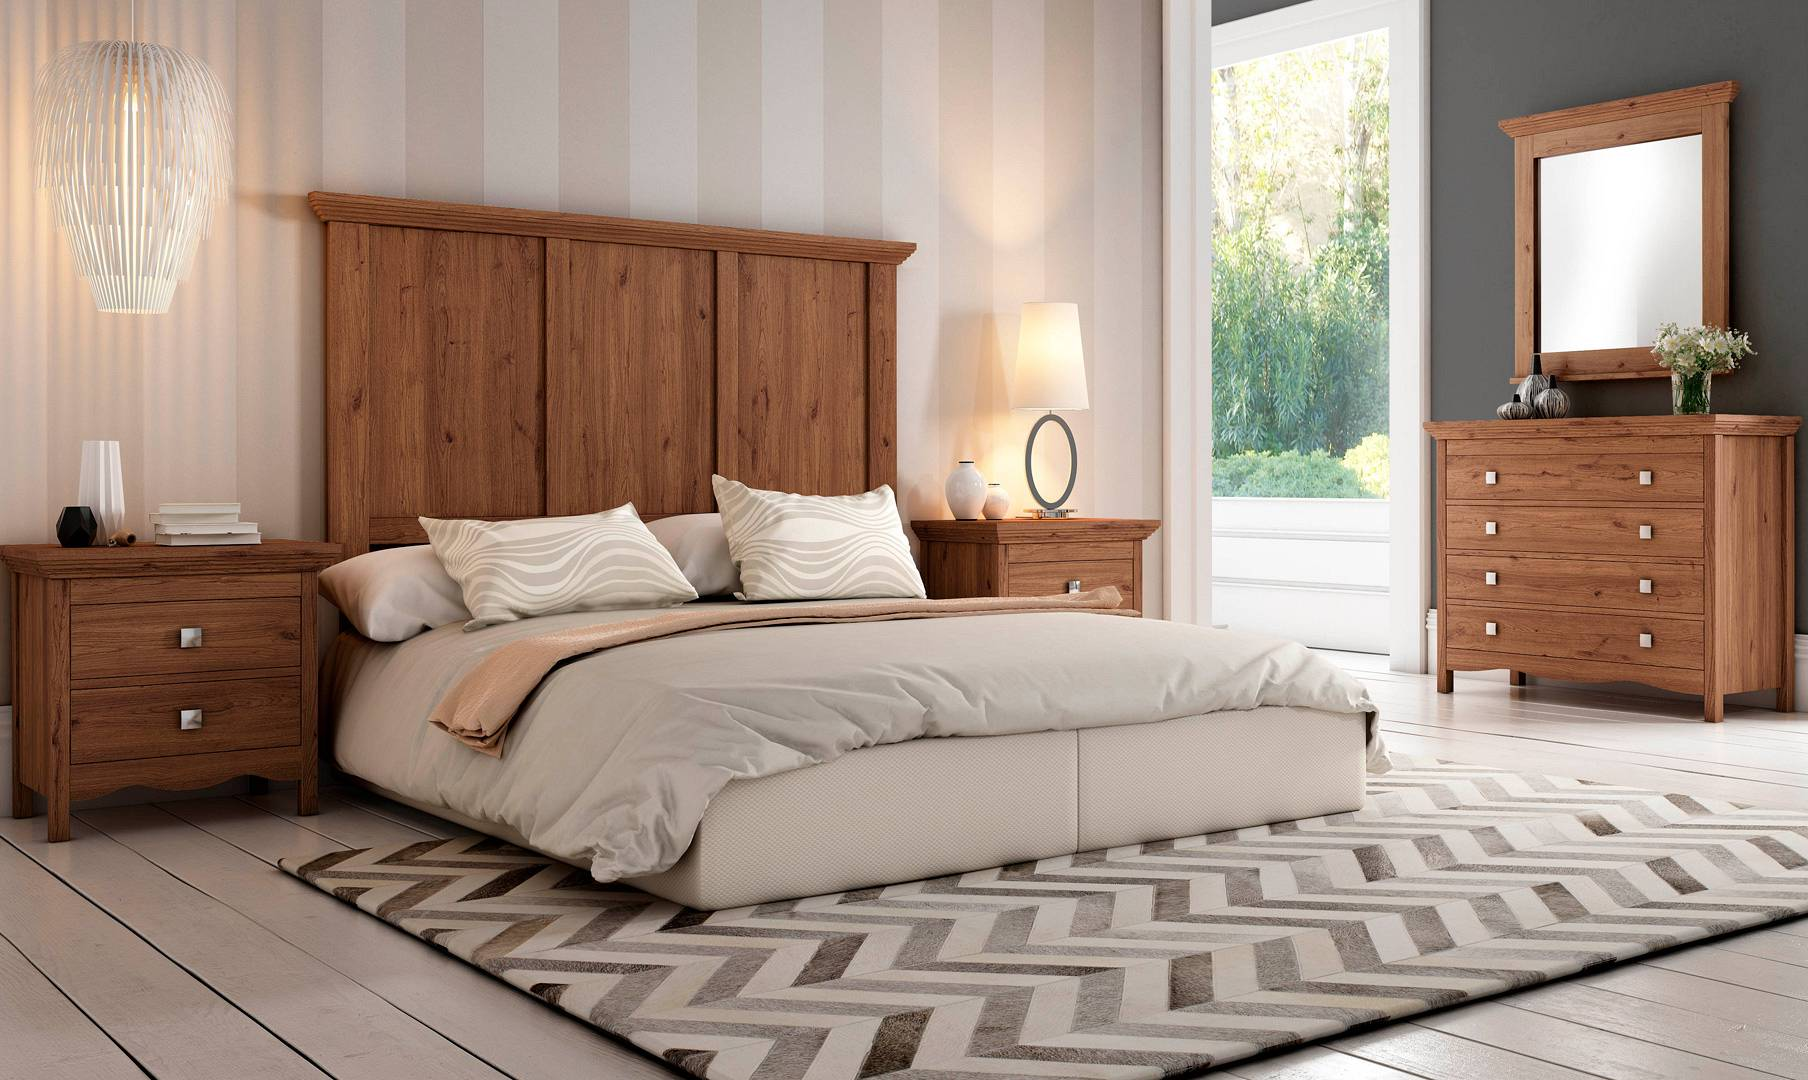 Dormitorios | Rapimueble